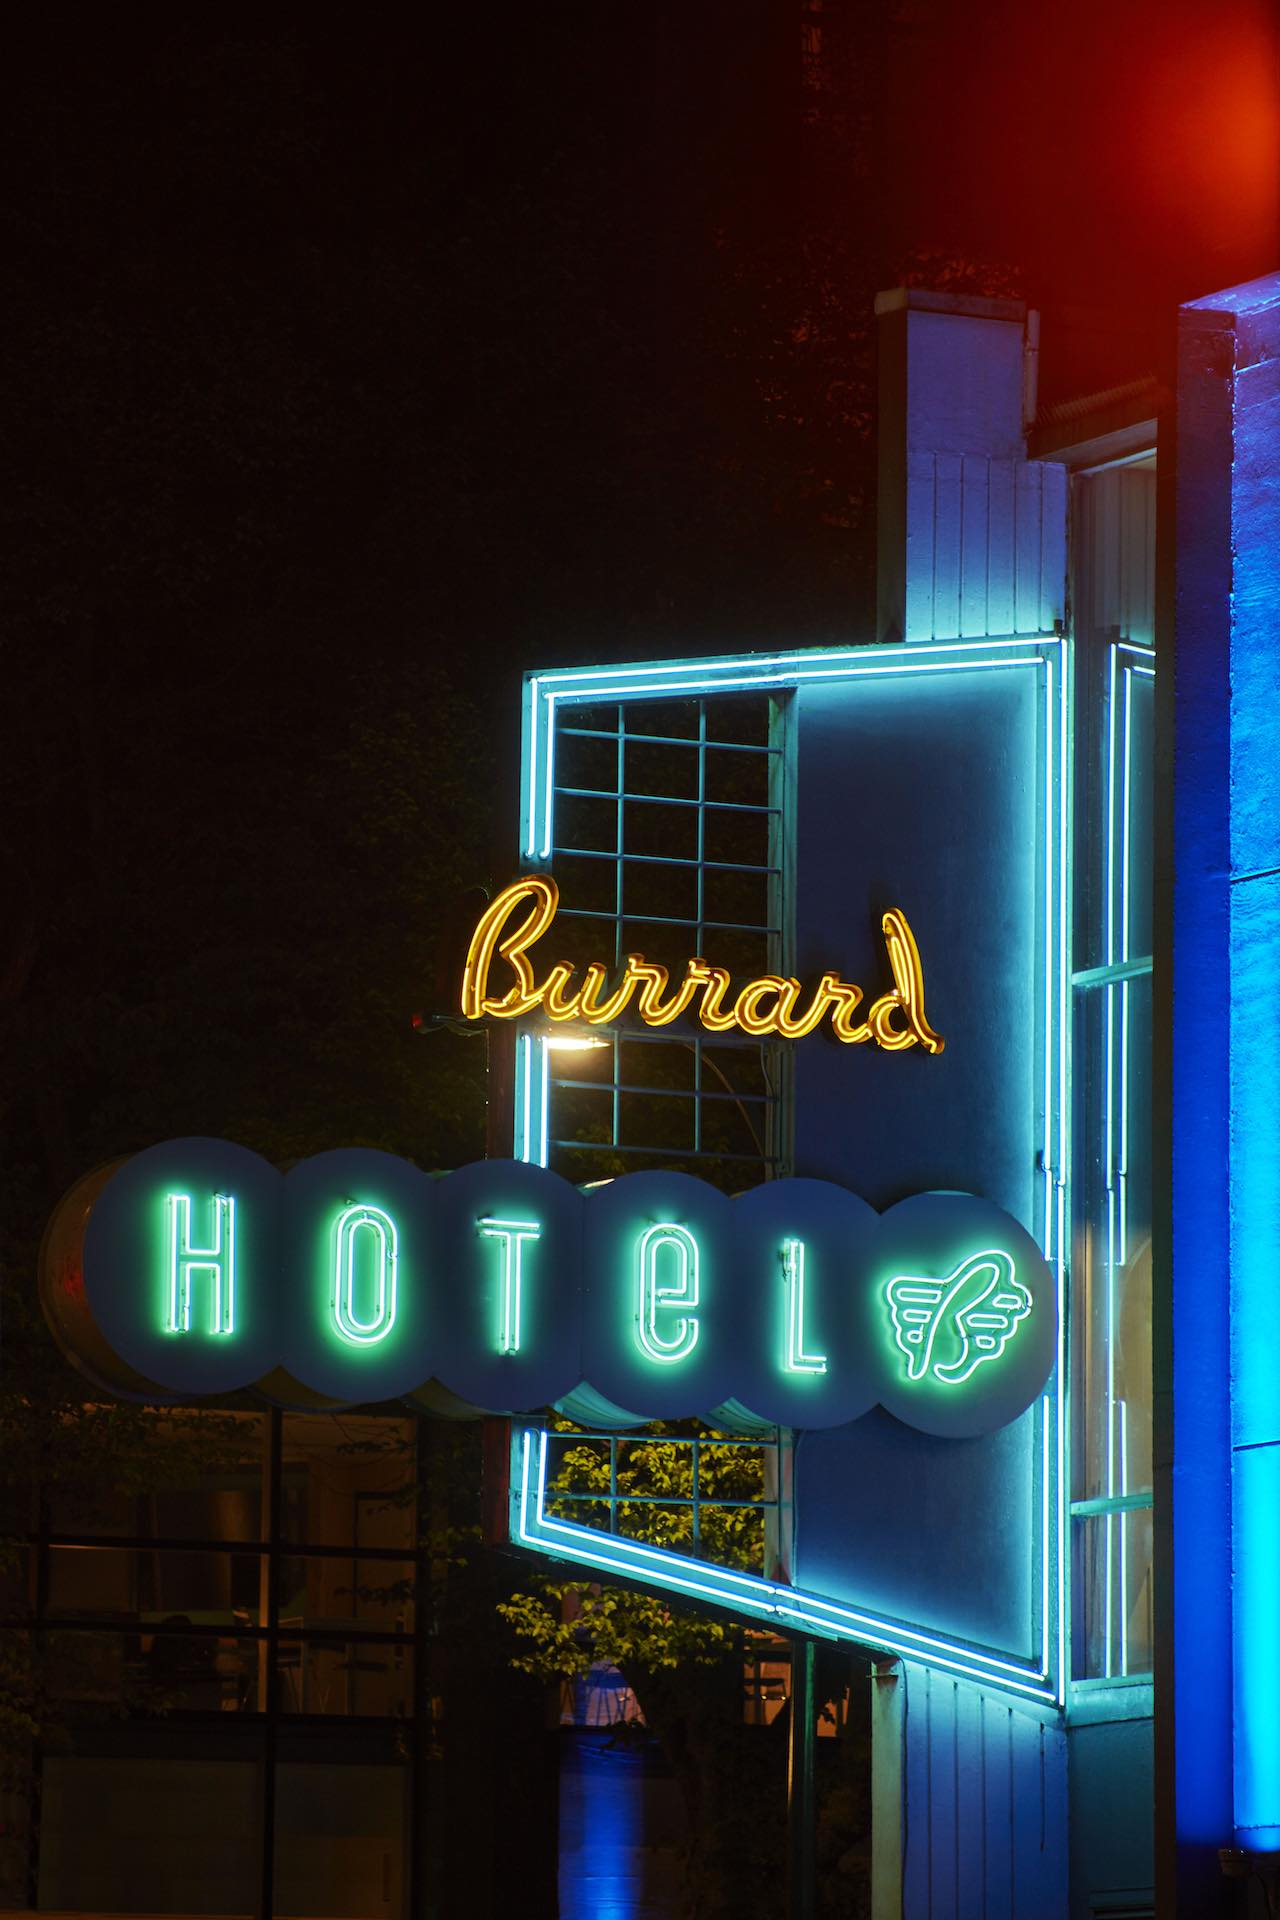 The Burrard Vancouver